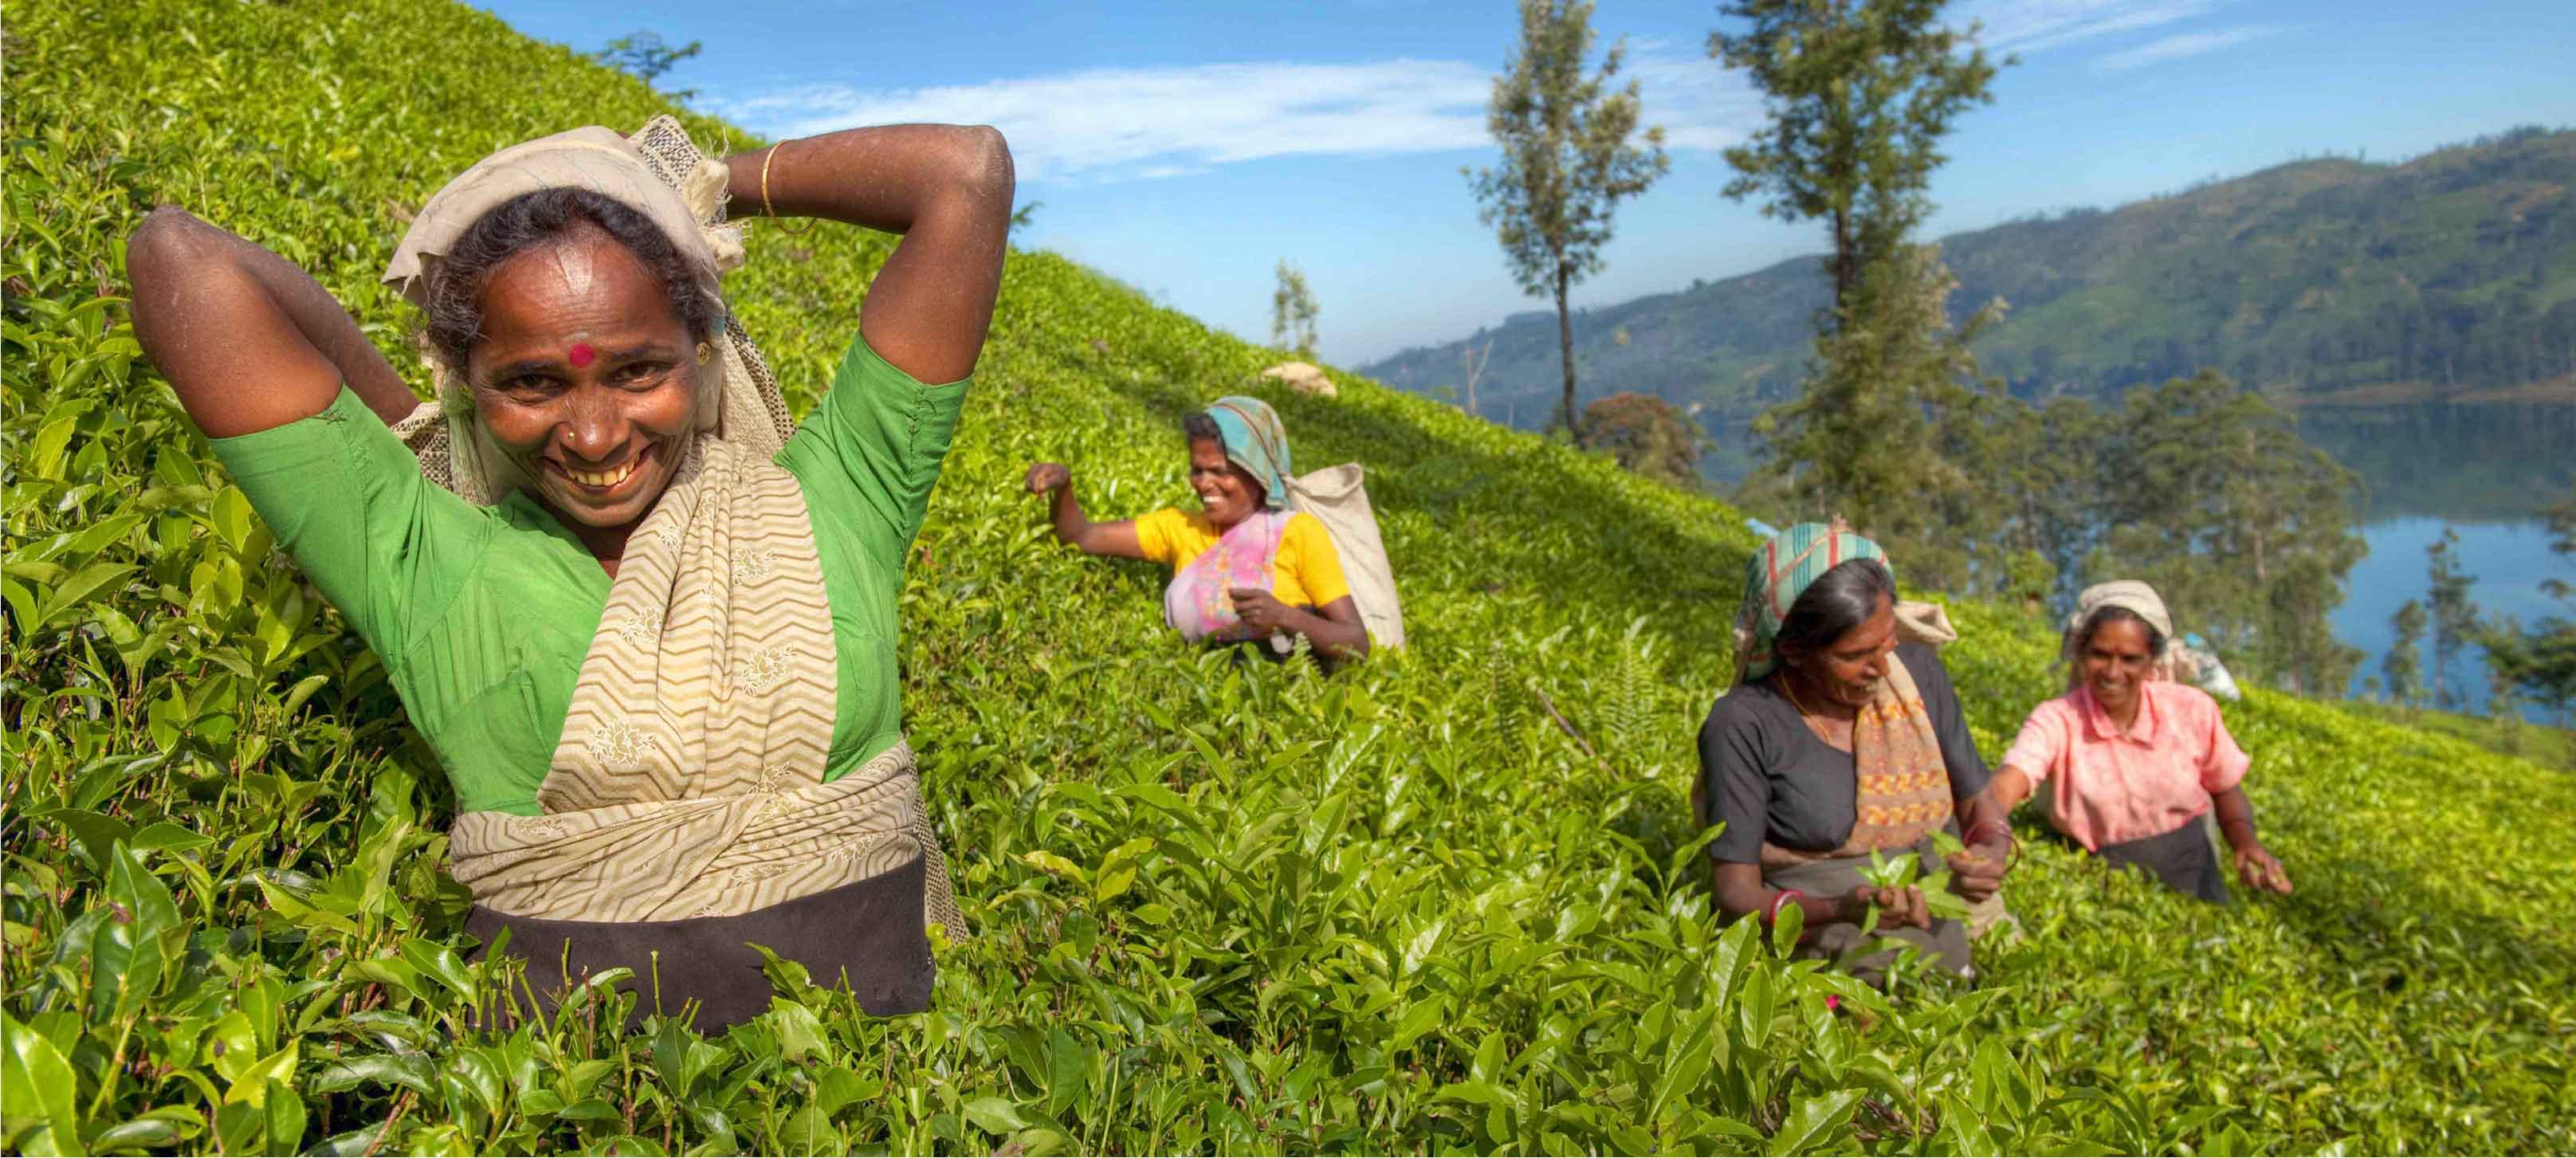 Australian Fintech AgUnity Wins Investment of €150,000 to Empower Smallholder Farmers